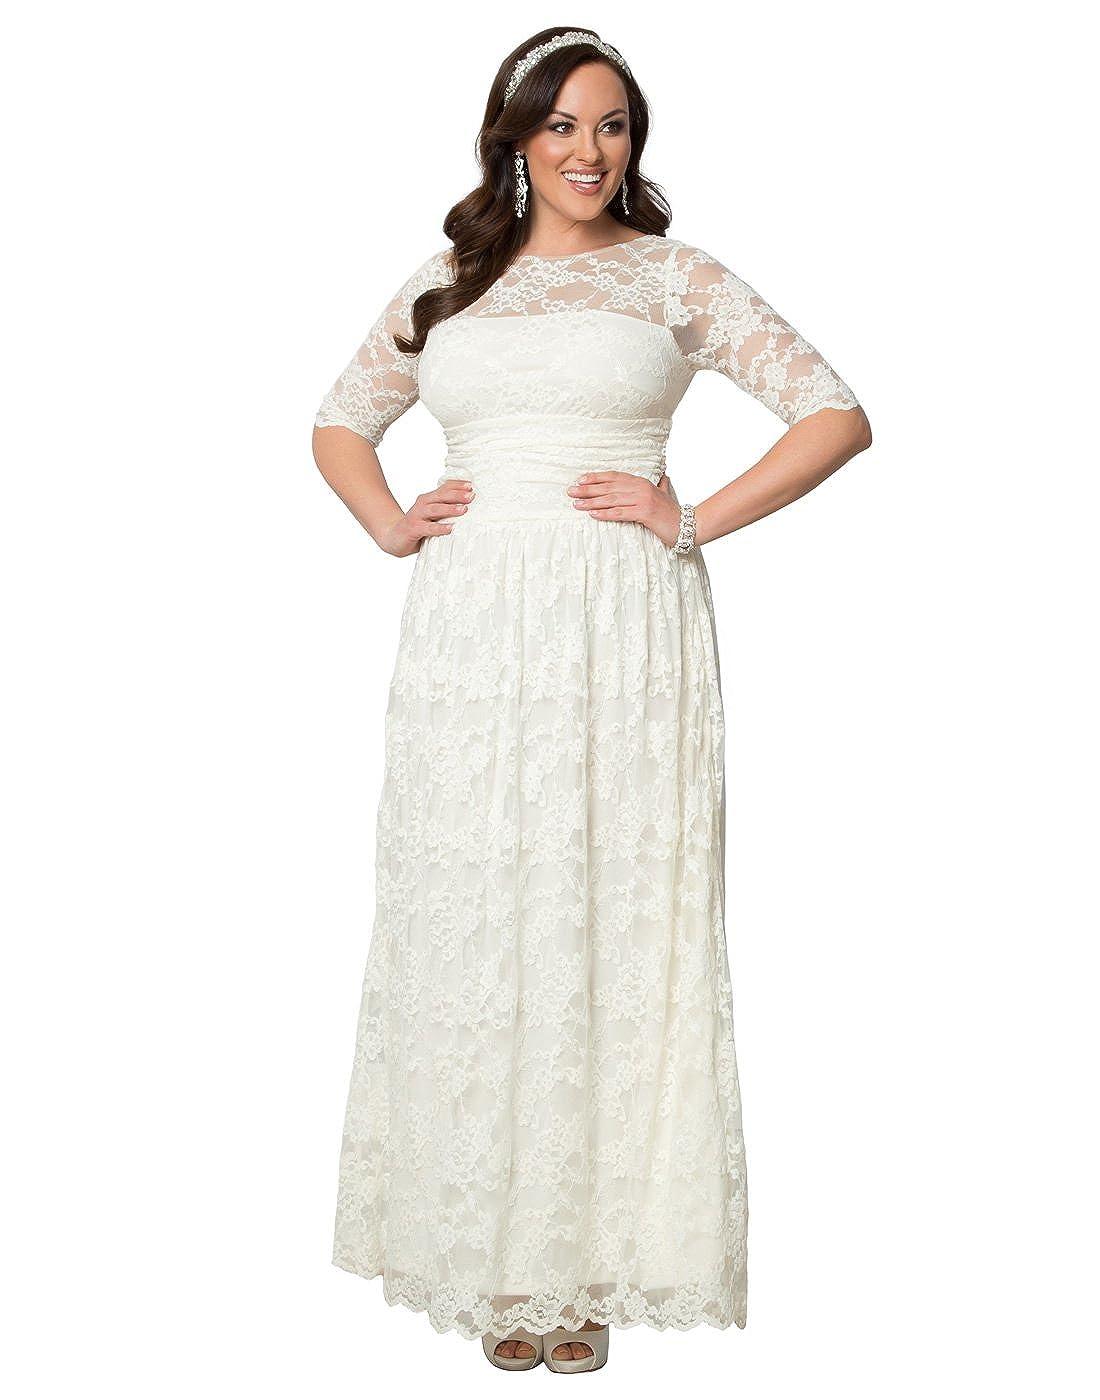 Kiyonna womens plus size lace illusion wedding gown at amazon kiyonna womens plus size lace illusion wedding gown at amazon womens clothing store junglespirit Image collections